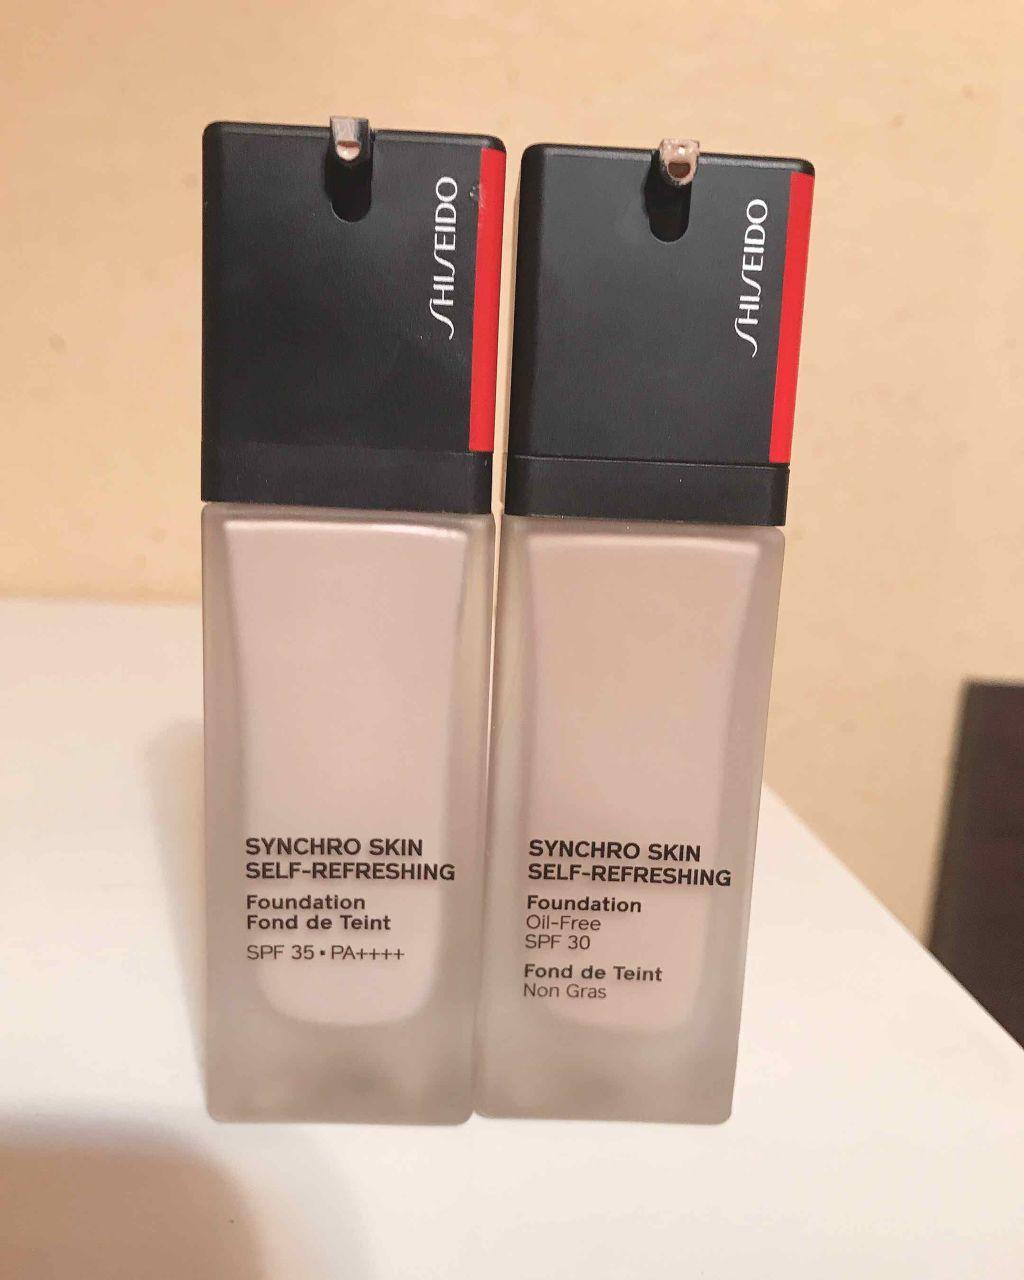 shiseido シンクロ スキン セルフ リフレッシング ファンデーション